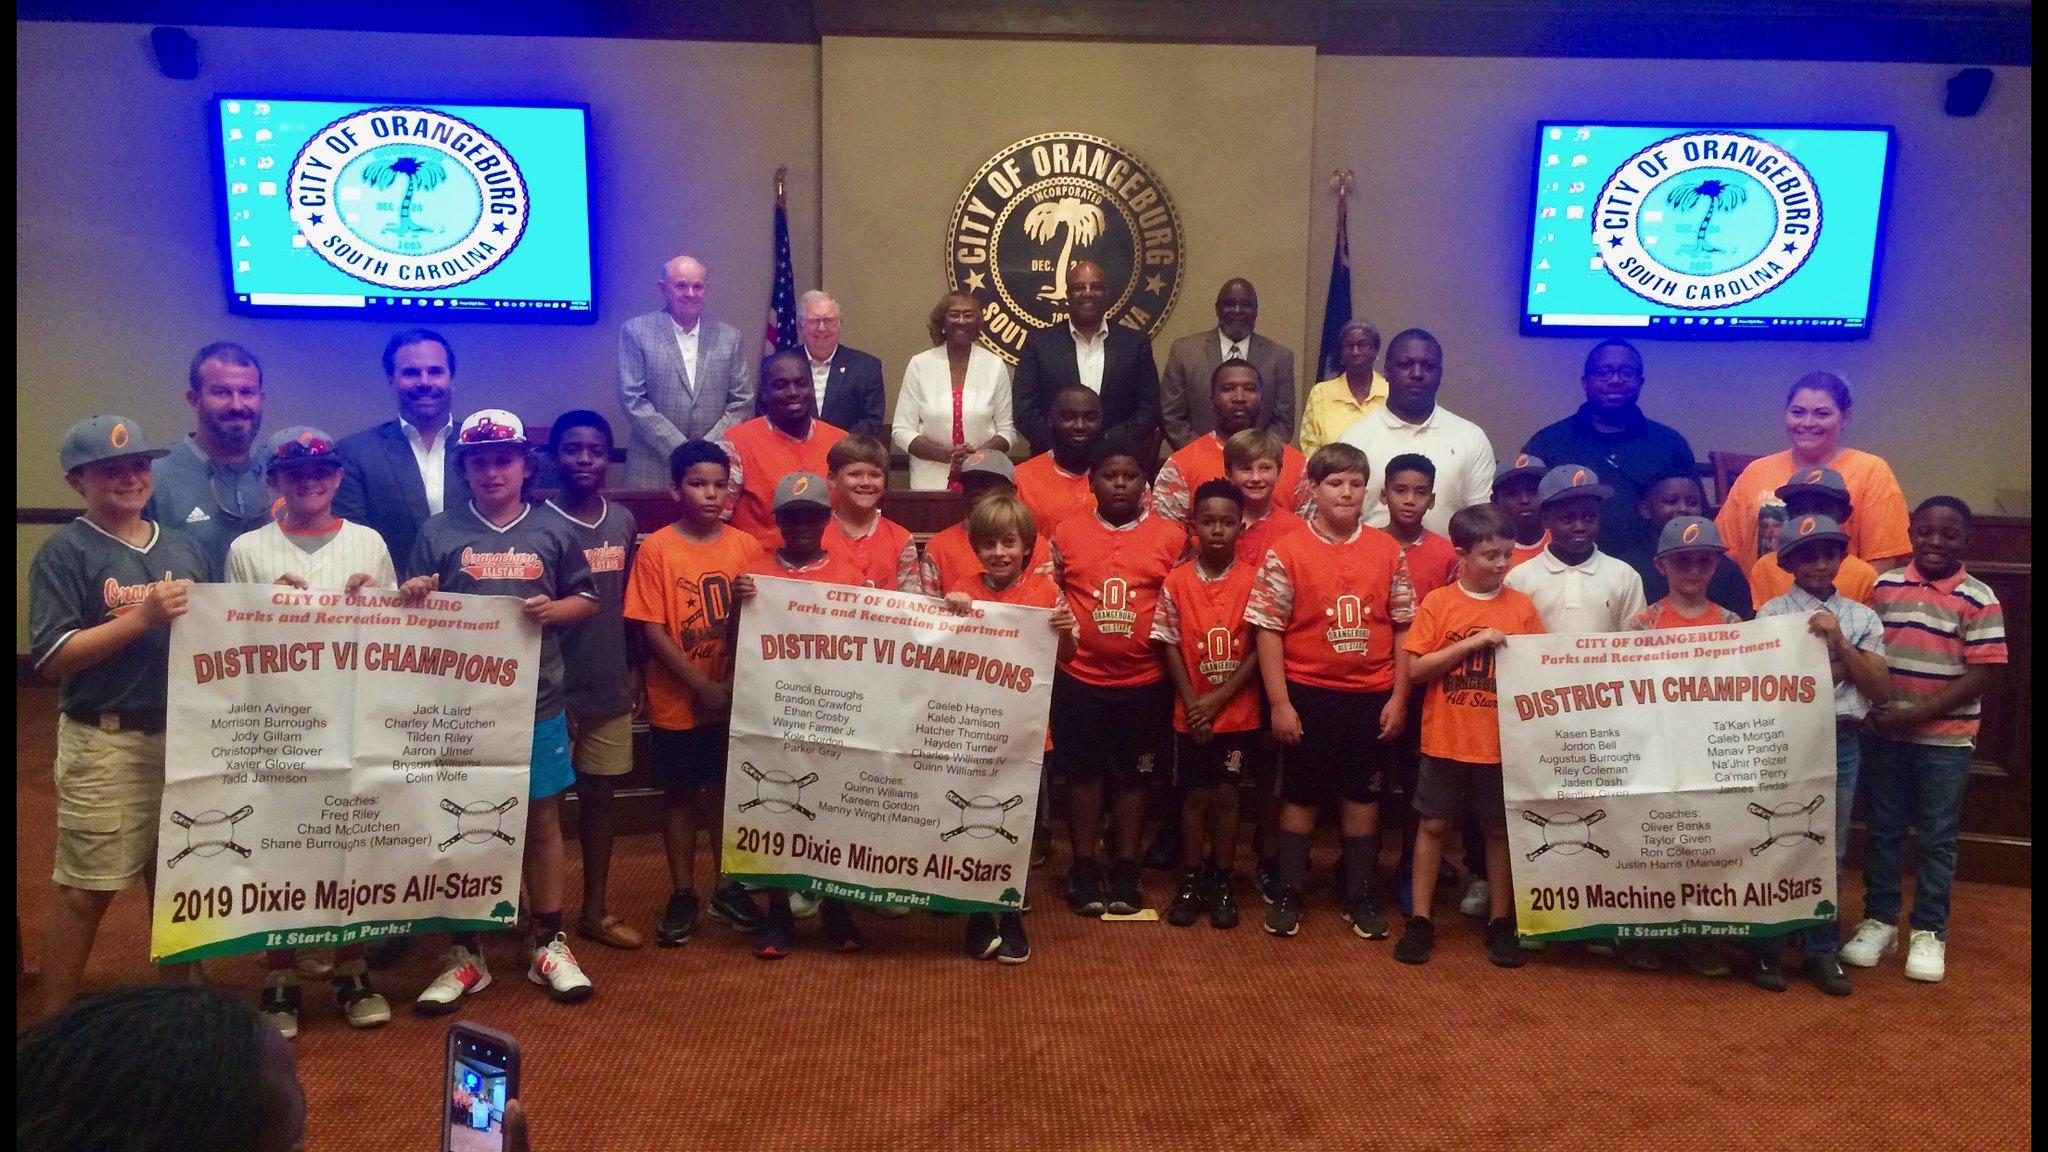 Orangeburg Parks and Recreation - Youth Baseball/Softball